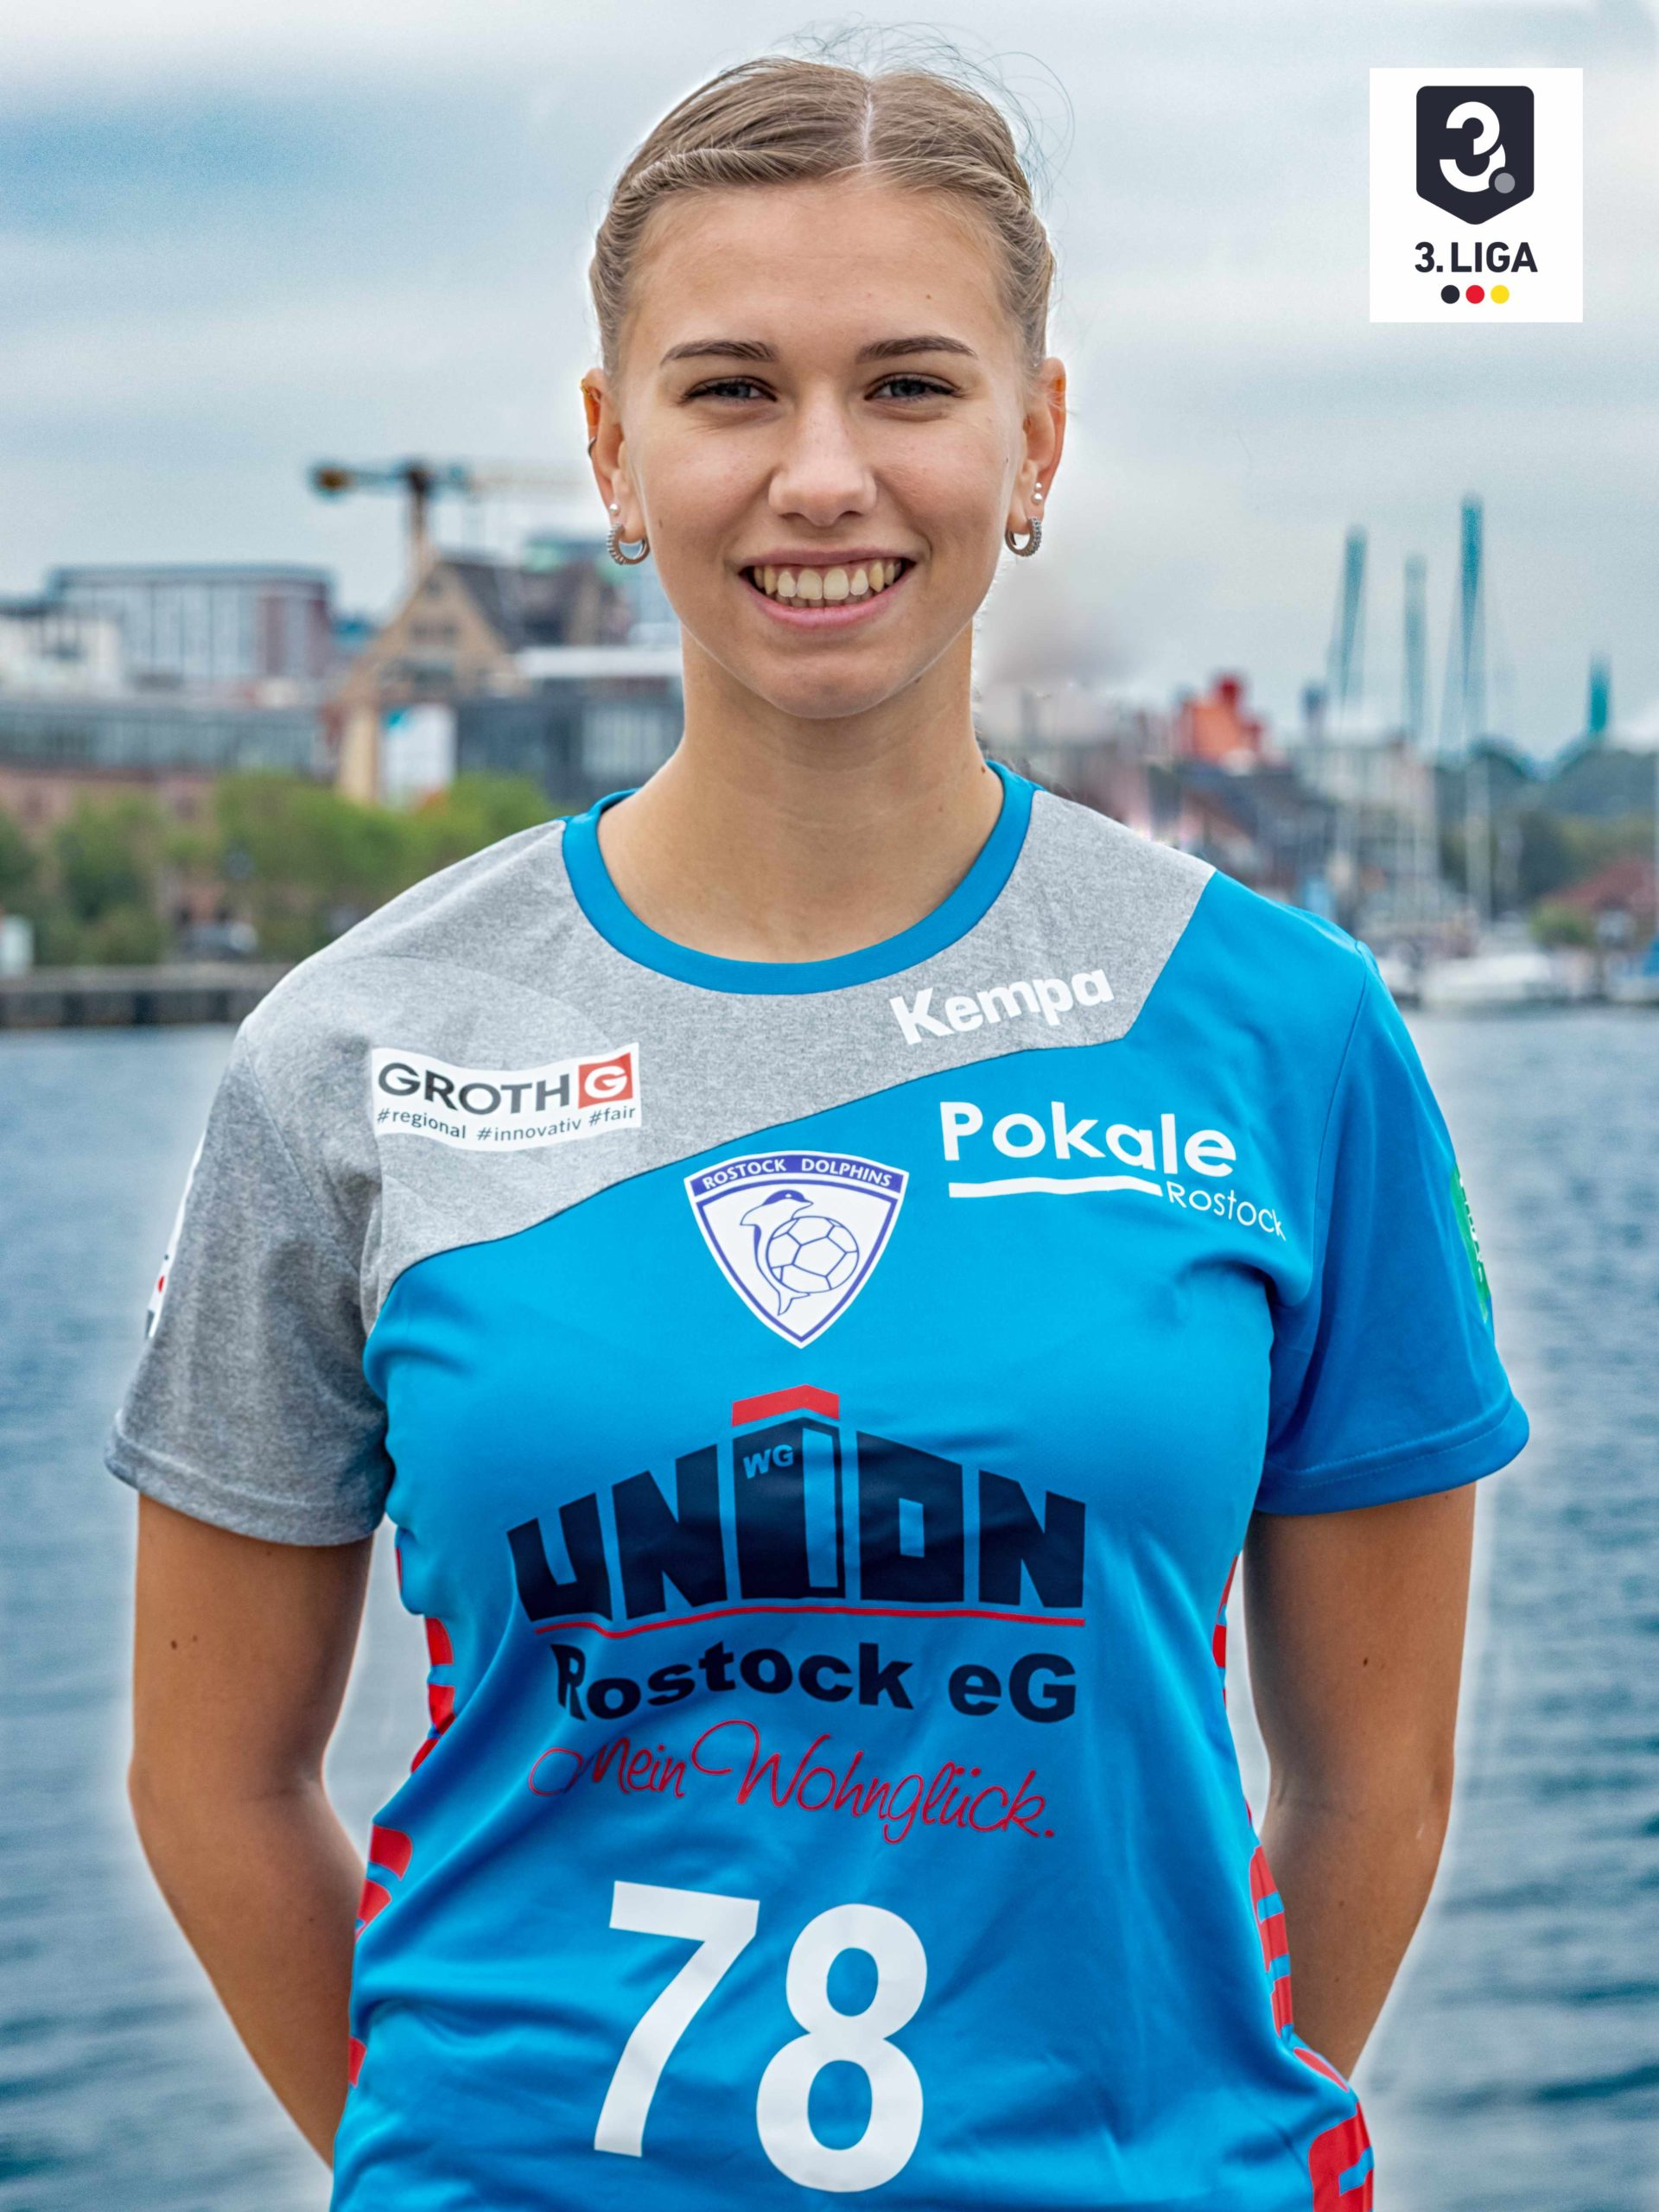 Nicole Rotfuß